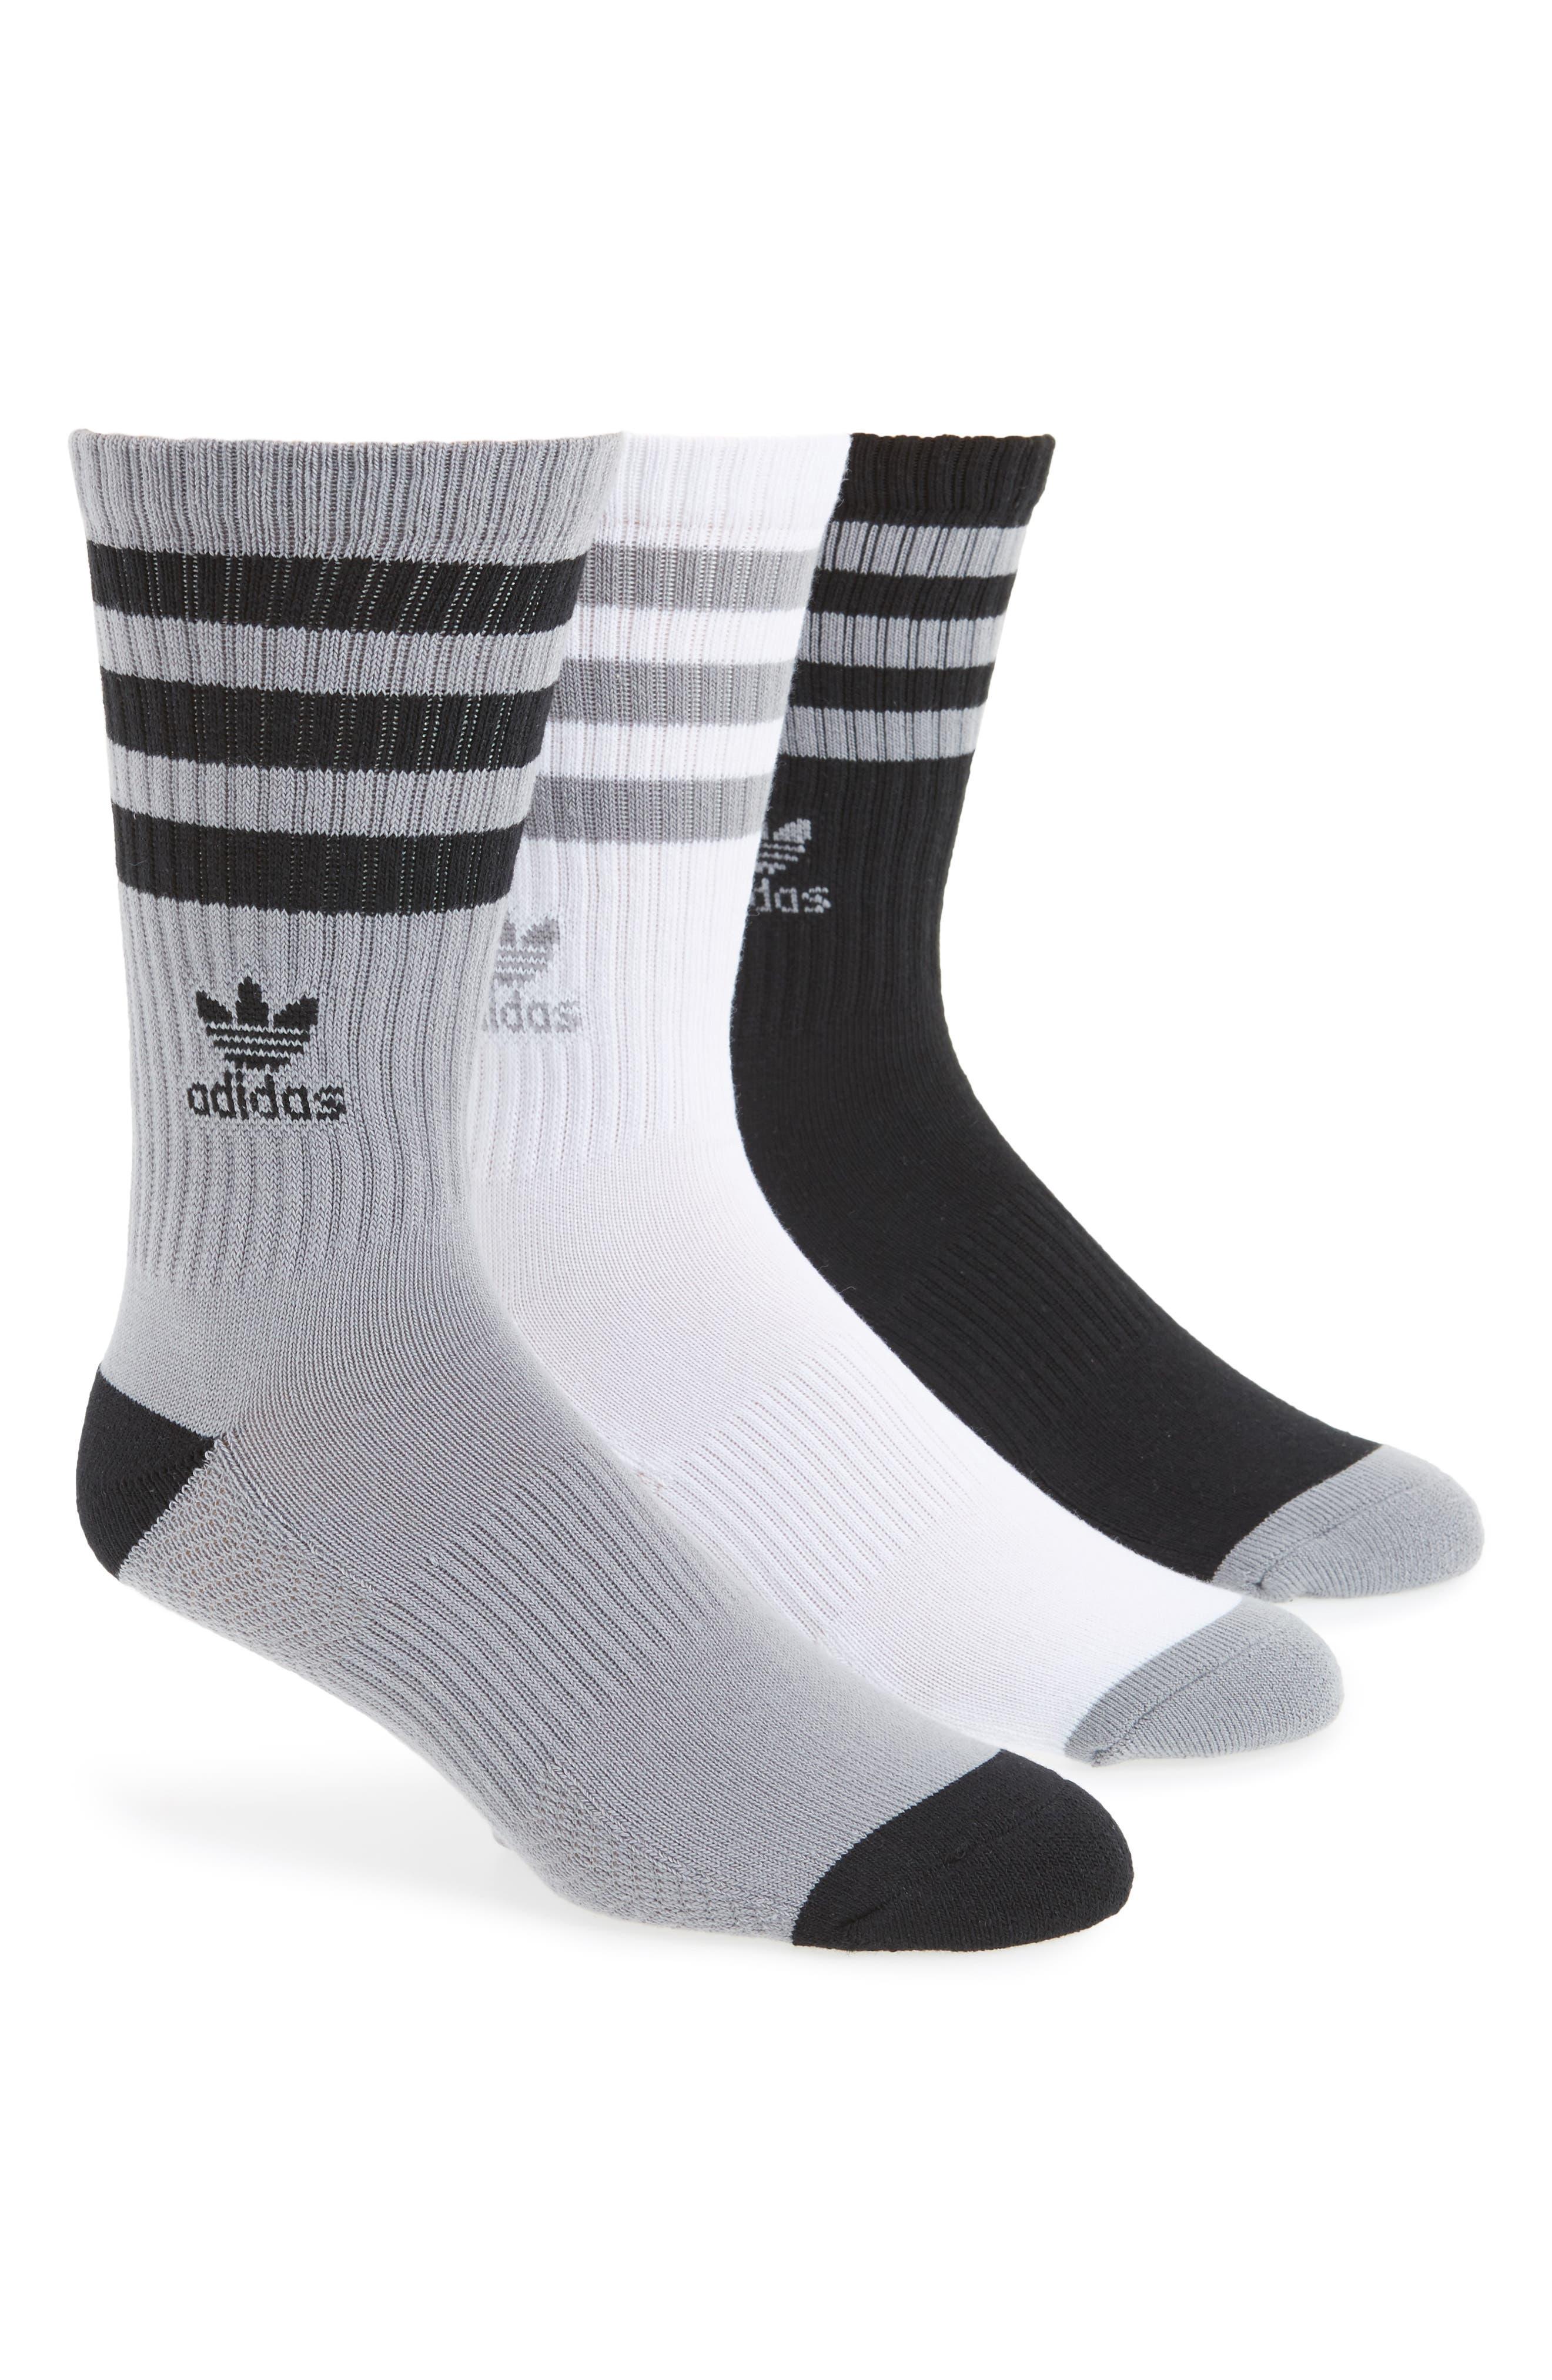 ADIDAS ORIGINALS, 3-Pack Ribbed Crew Socks, Main thumbnail 1, color, LIGHT ONYX/ BLACK/ WHITE